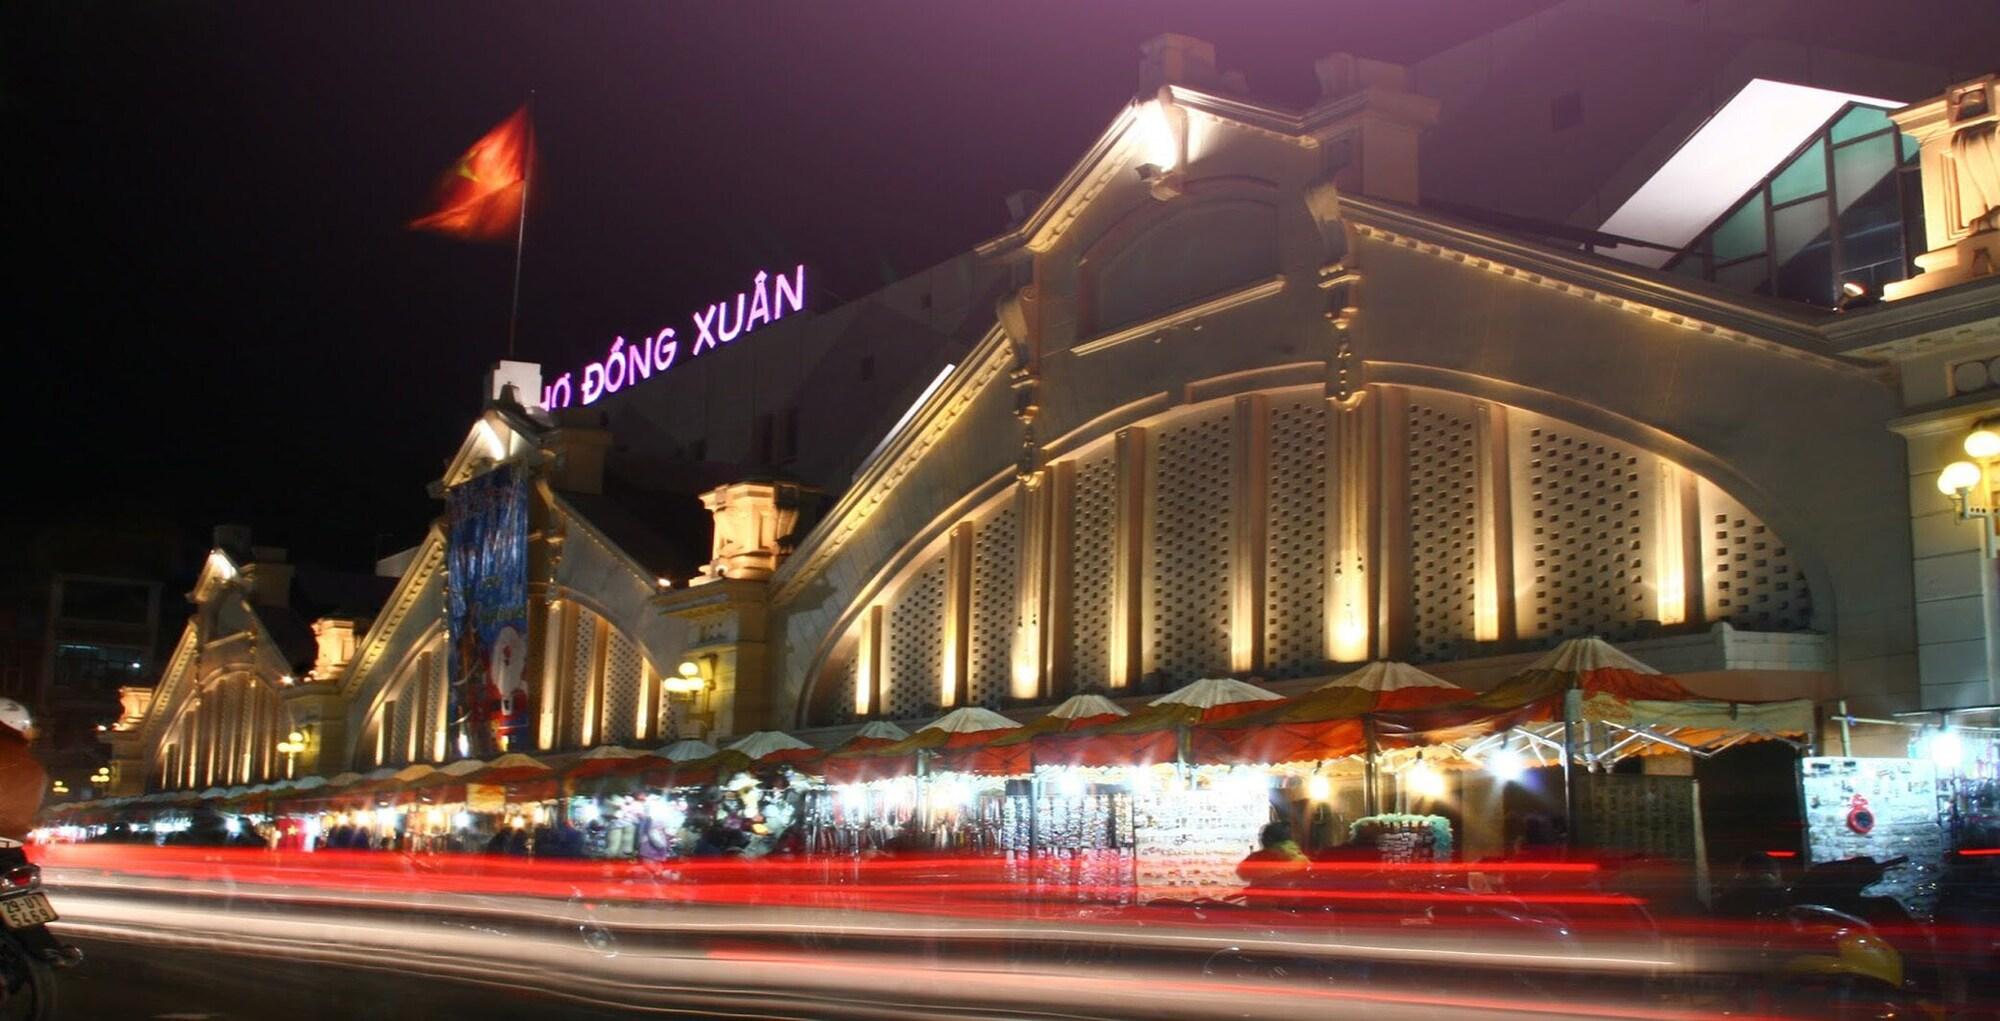 Domov Luxury Hotel, Ba Đình